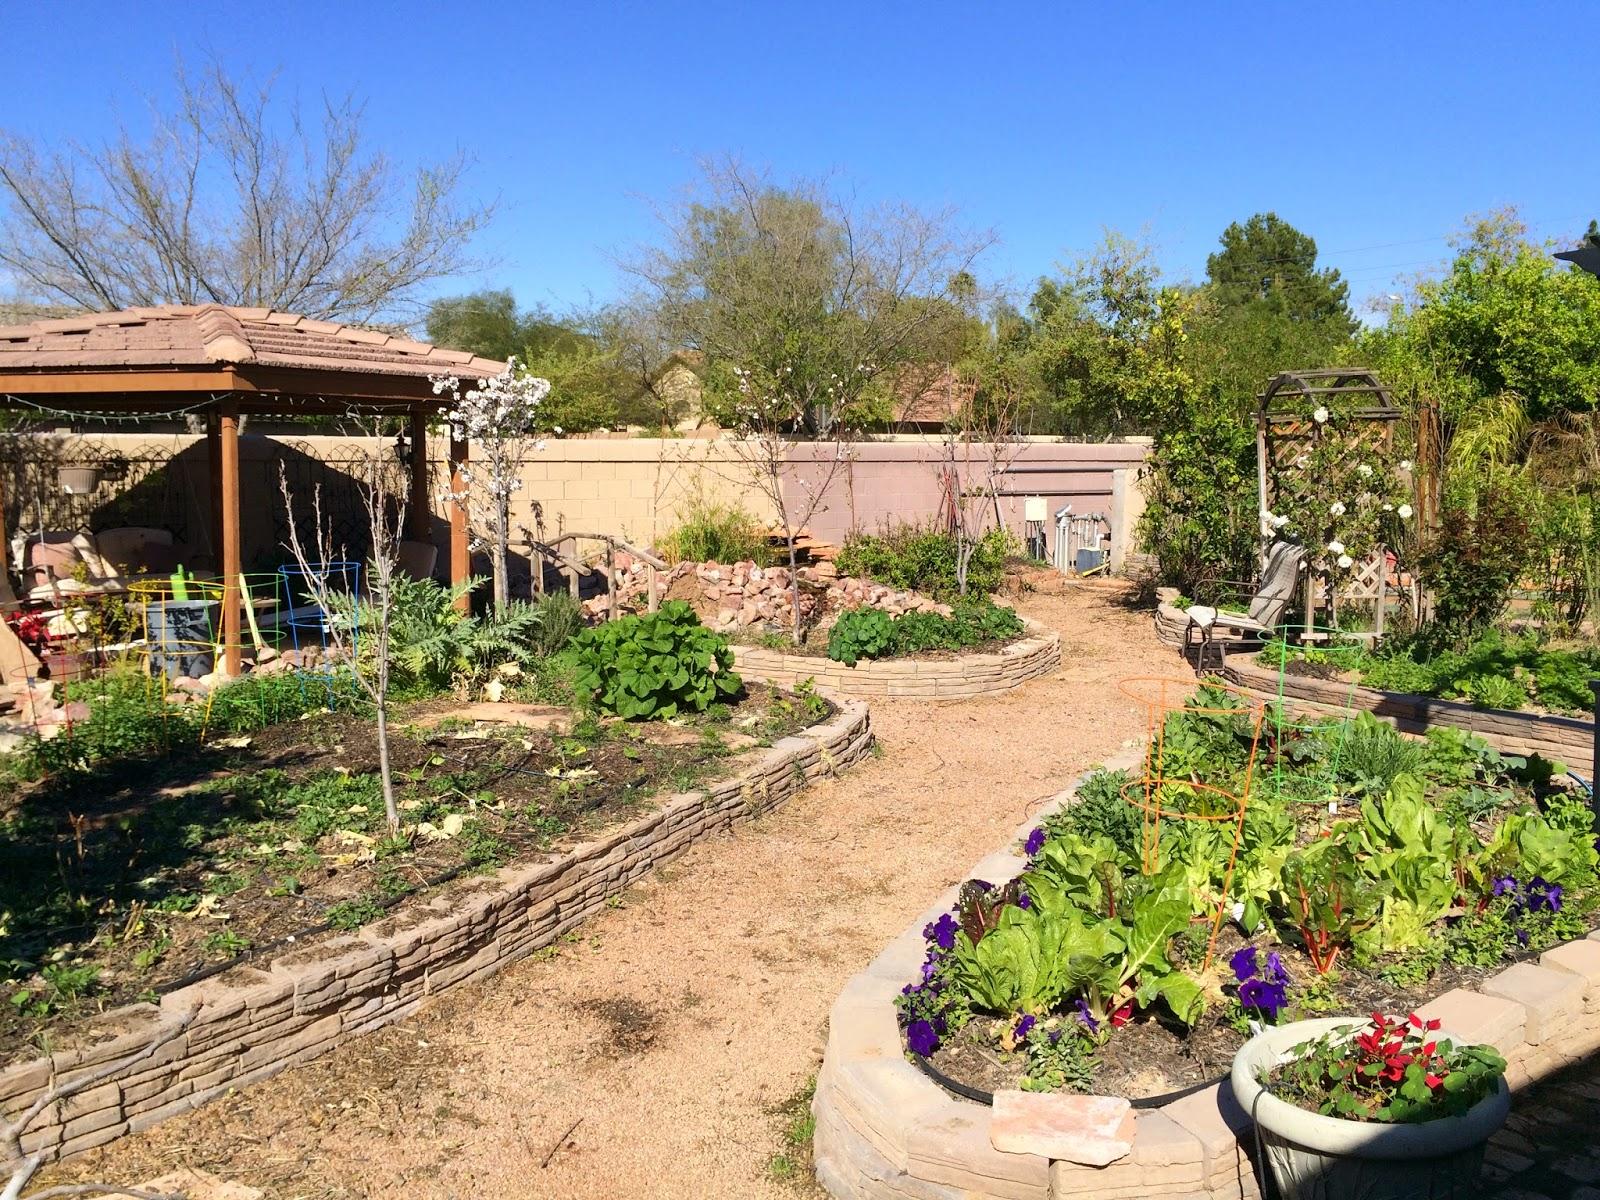 arizona backyard eden late february overview